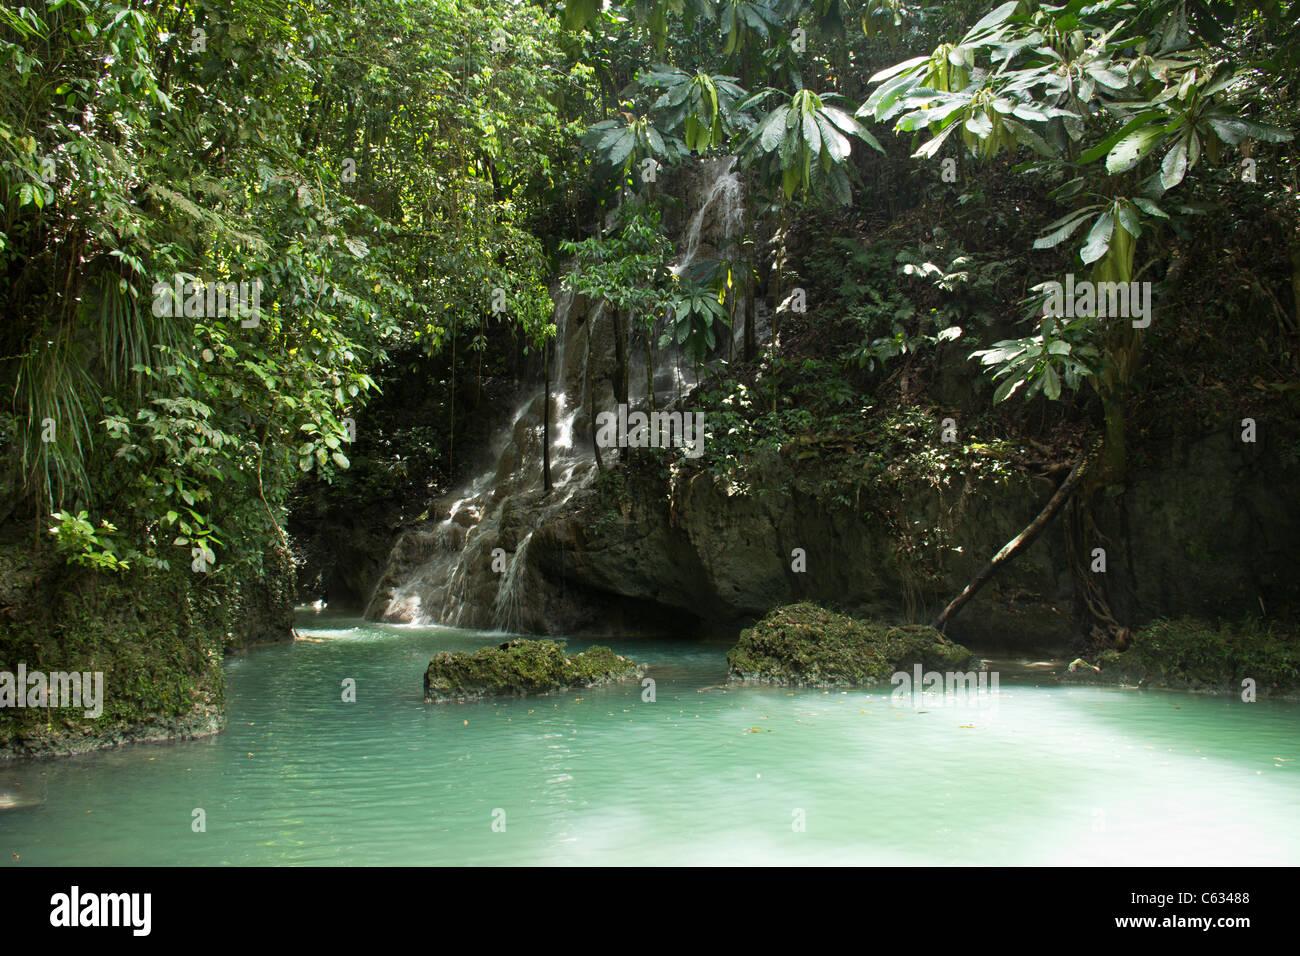 Somerset falls in Ocho Rios, Jamaica - Stock Image